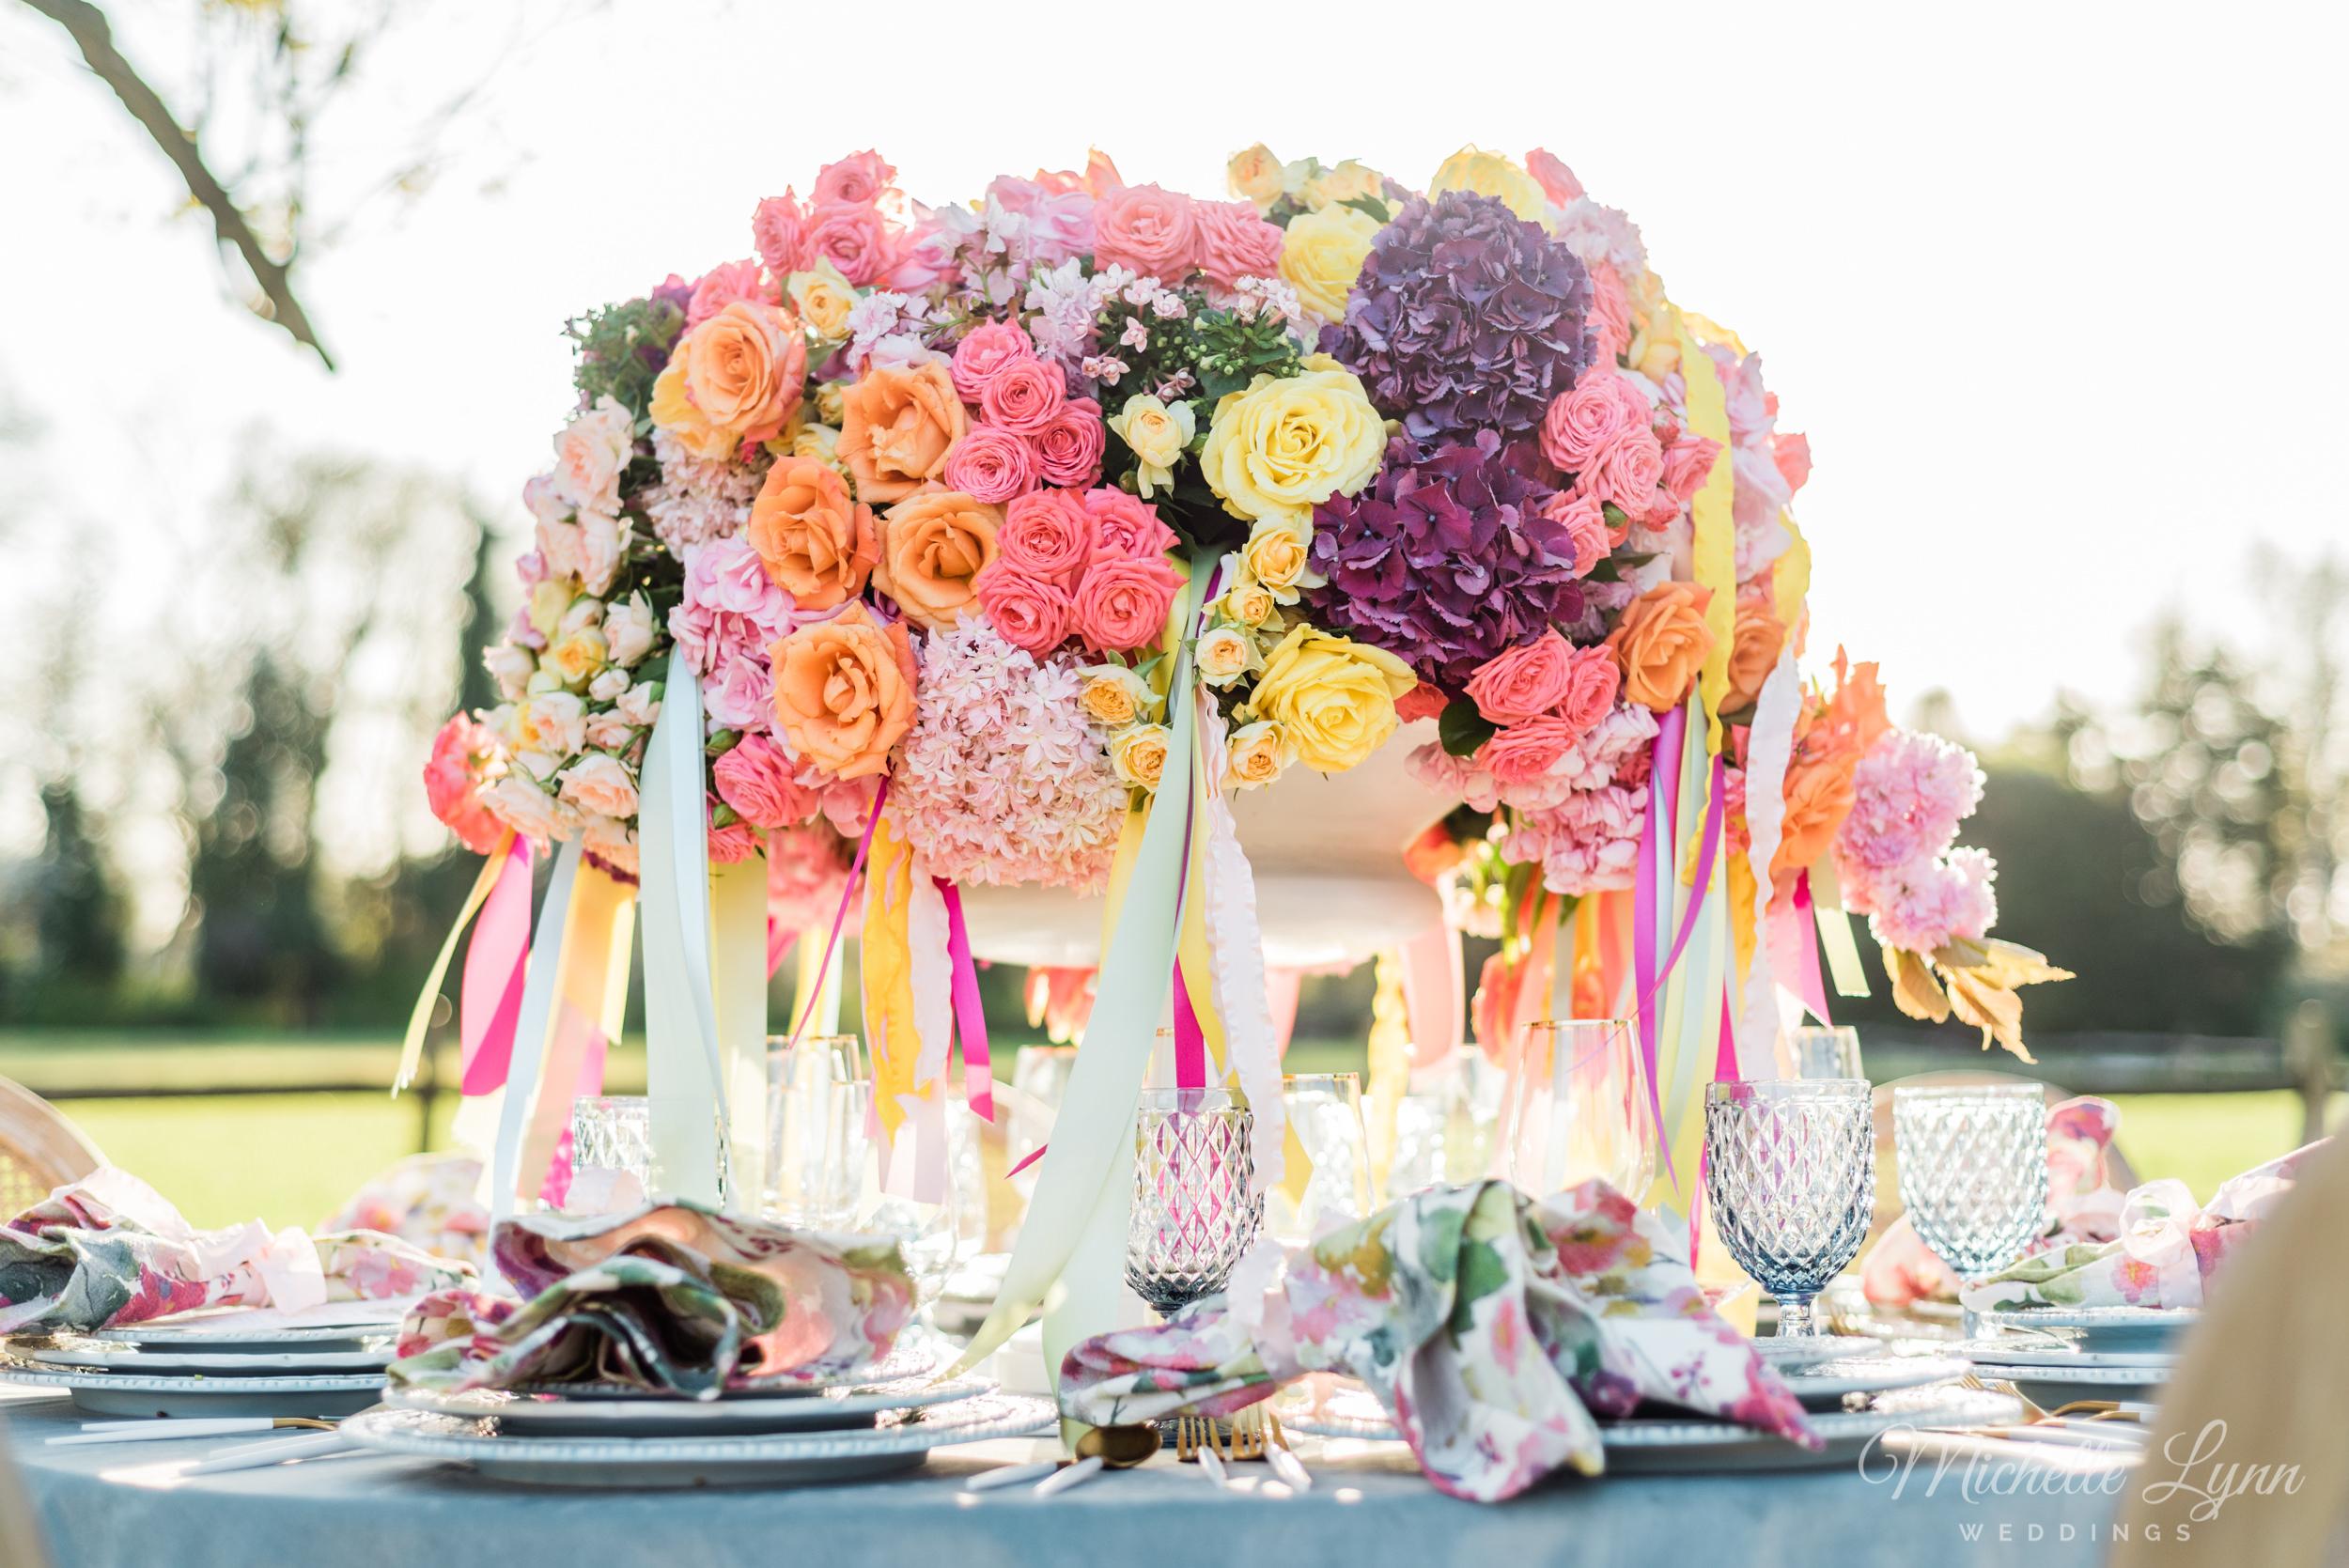 mlw-whitehall-annapolis-maryland-wedding-28.jpg